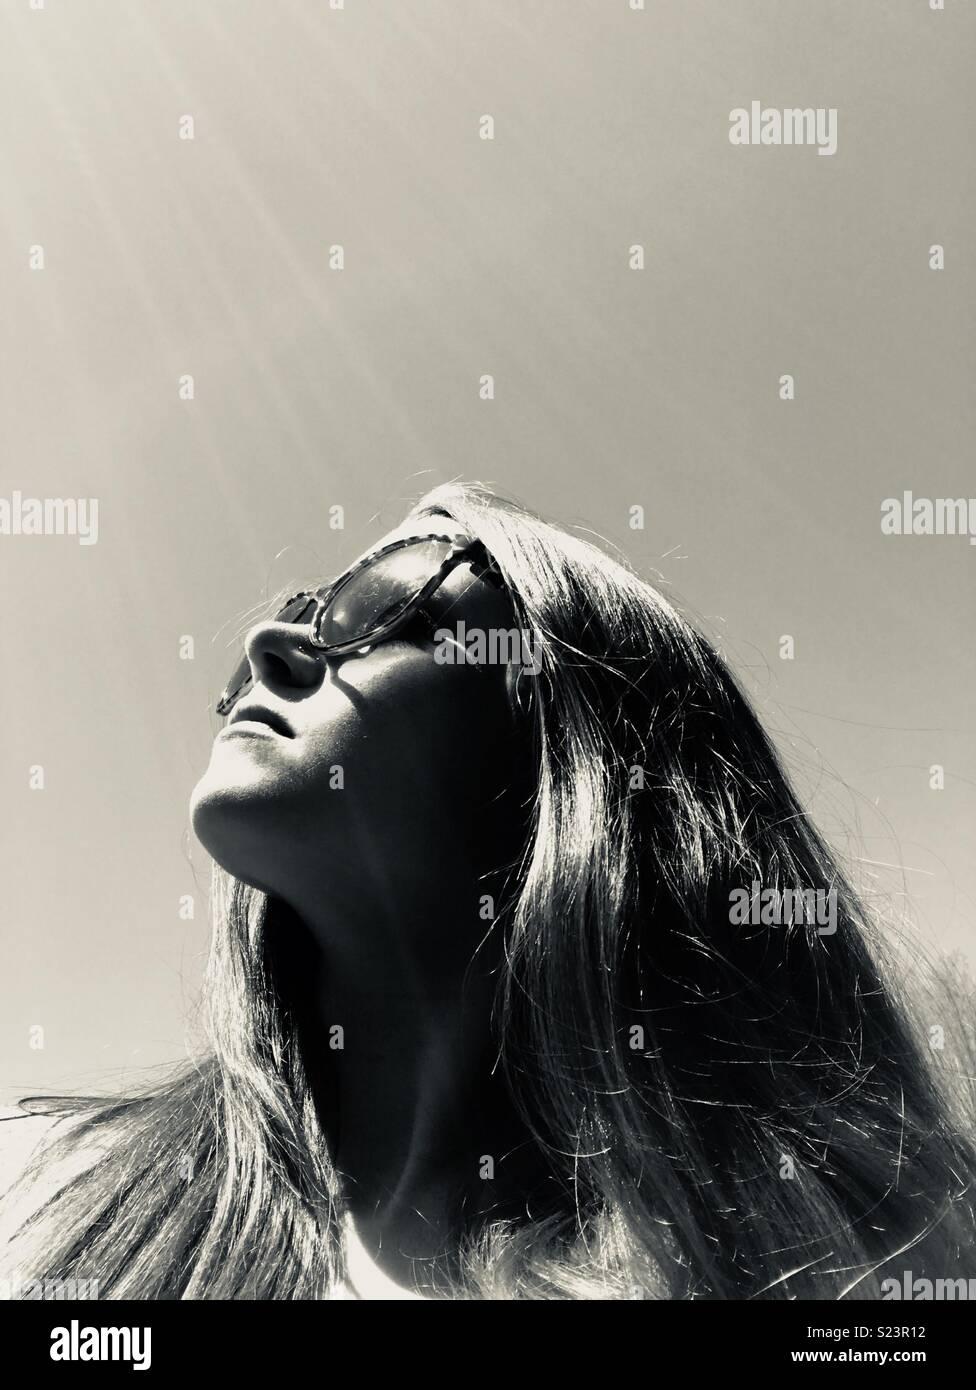 Sun shining down on girl with sunglasses - Stock Image